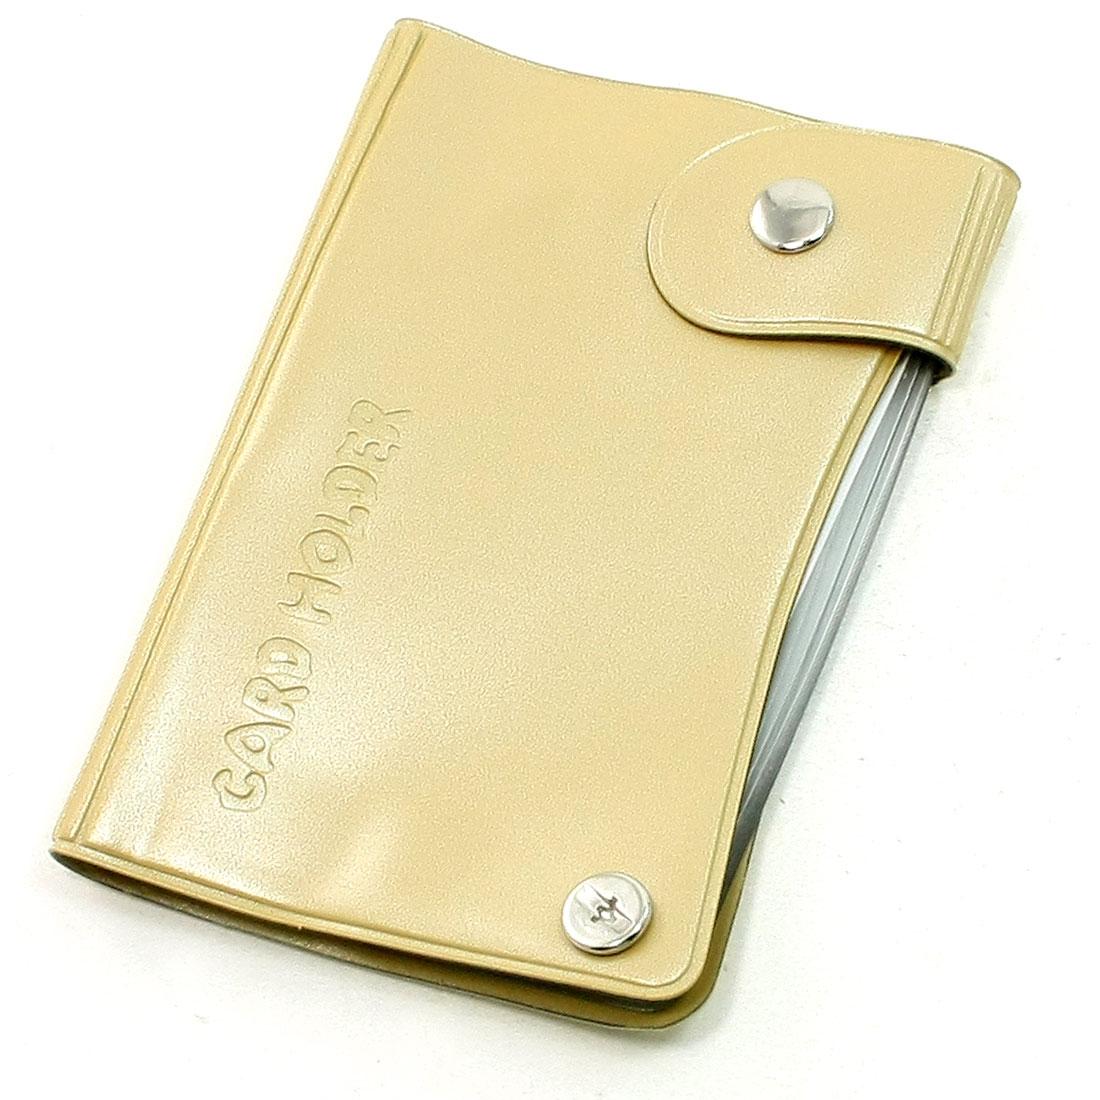 Light Brown Plastic Fit Size 9 x 6cm Multi Cards Holder